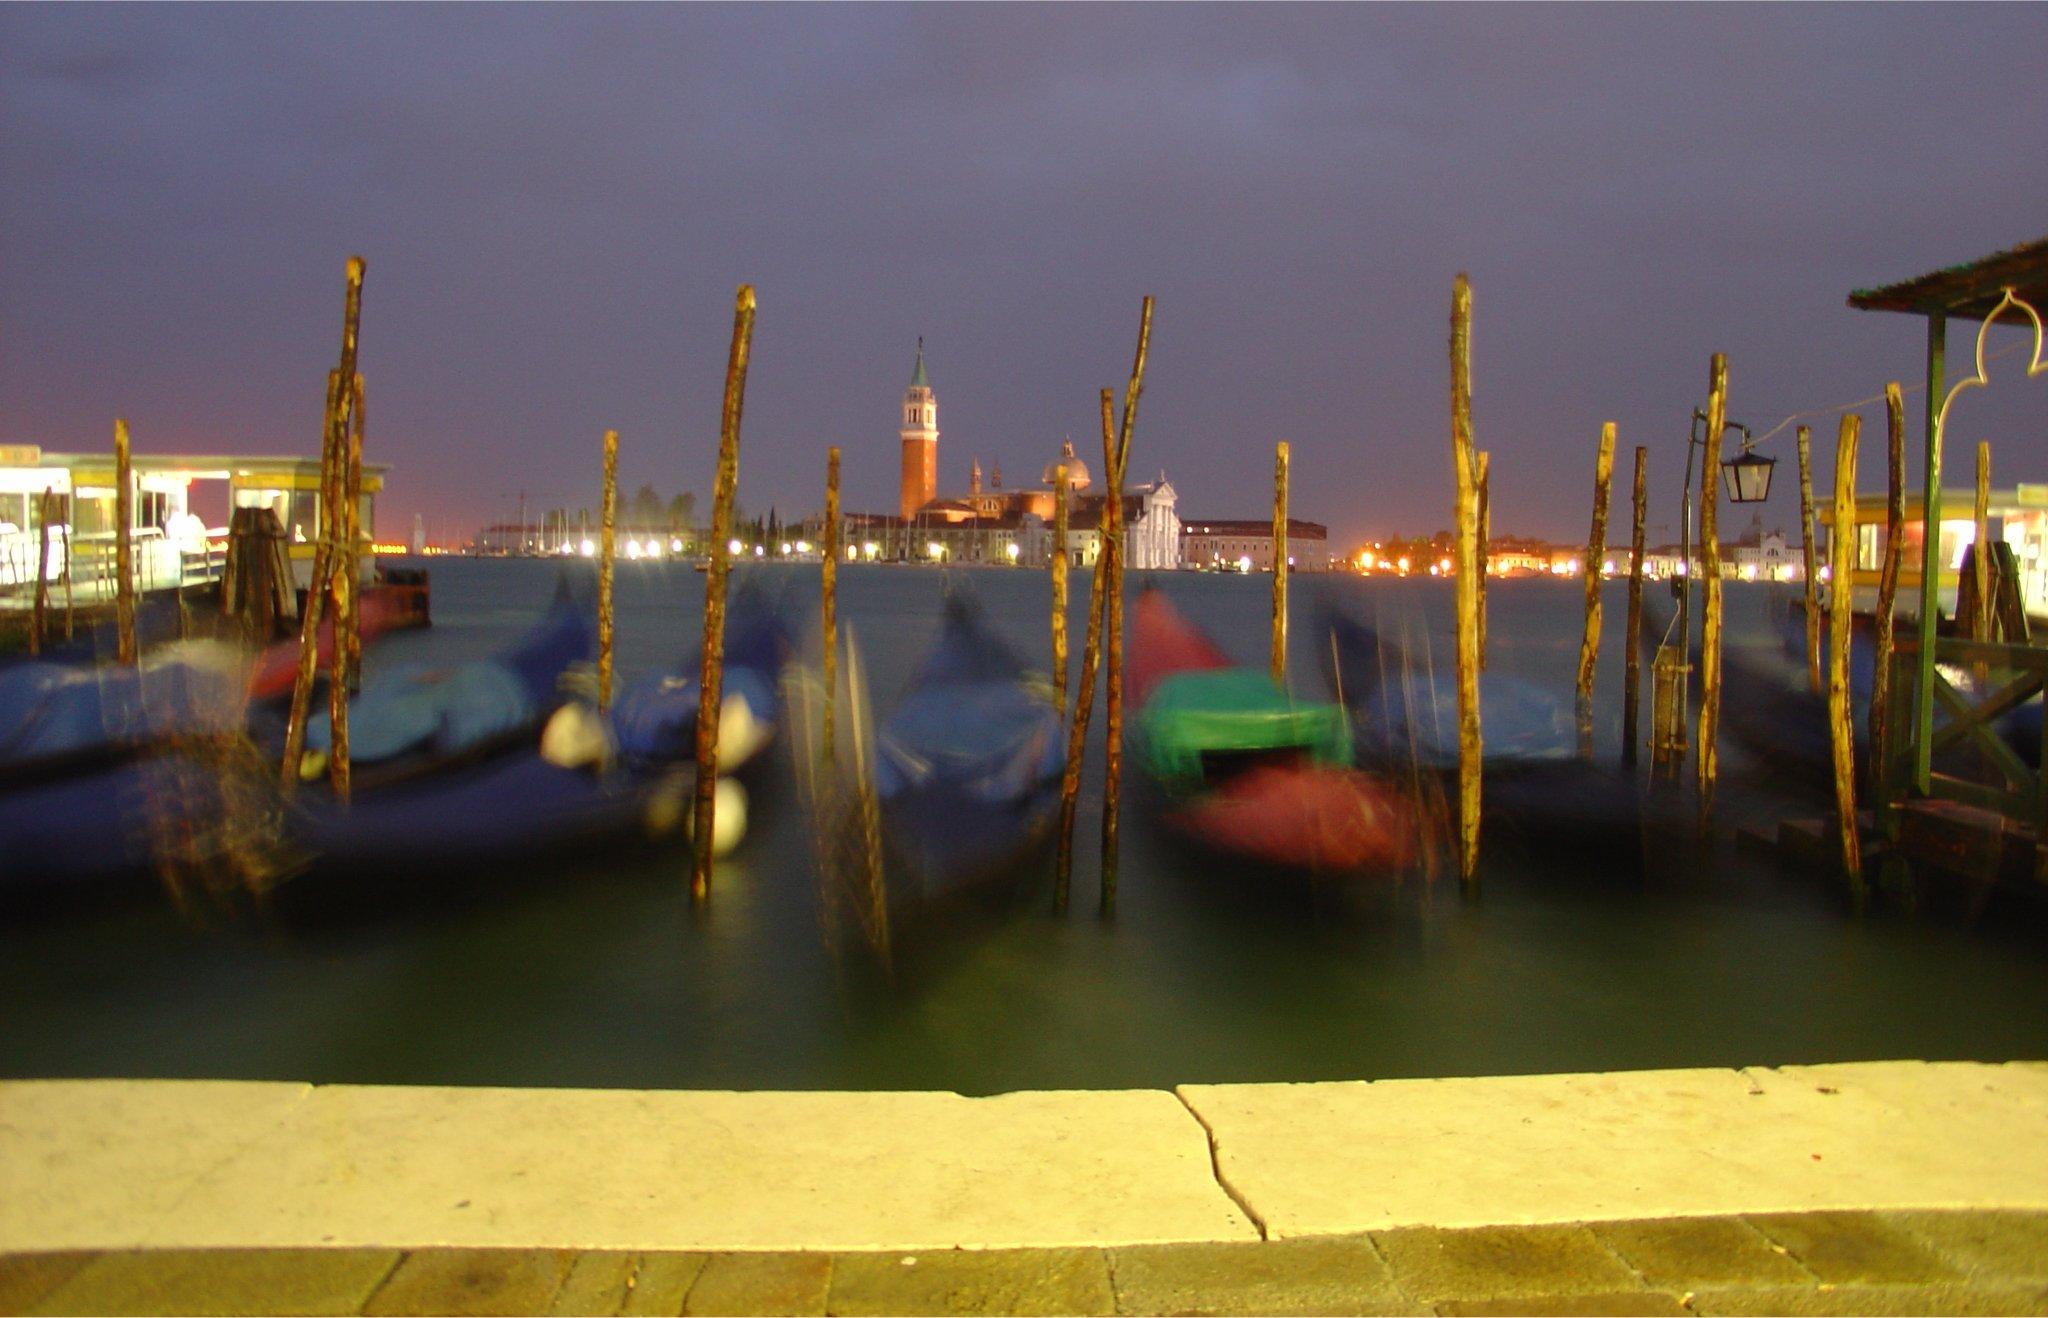 My trip to Italia 350_1.jpg